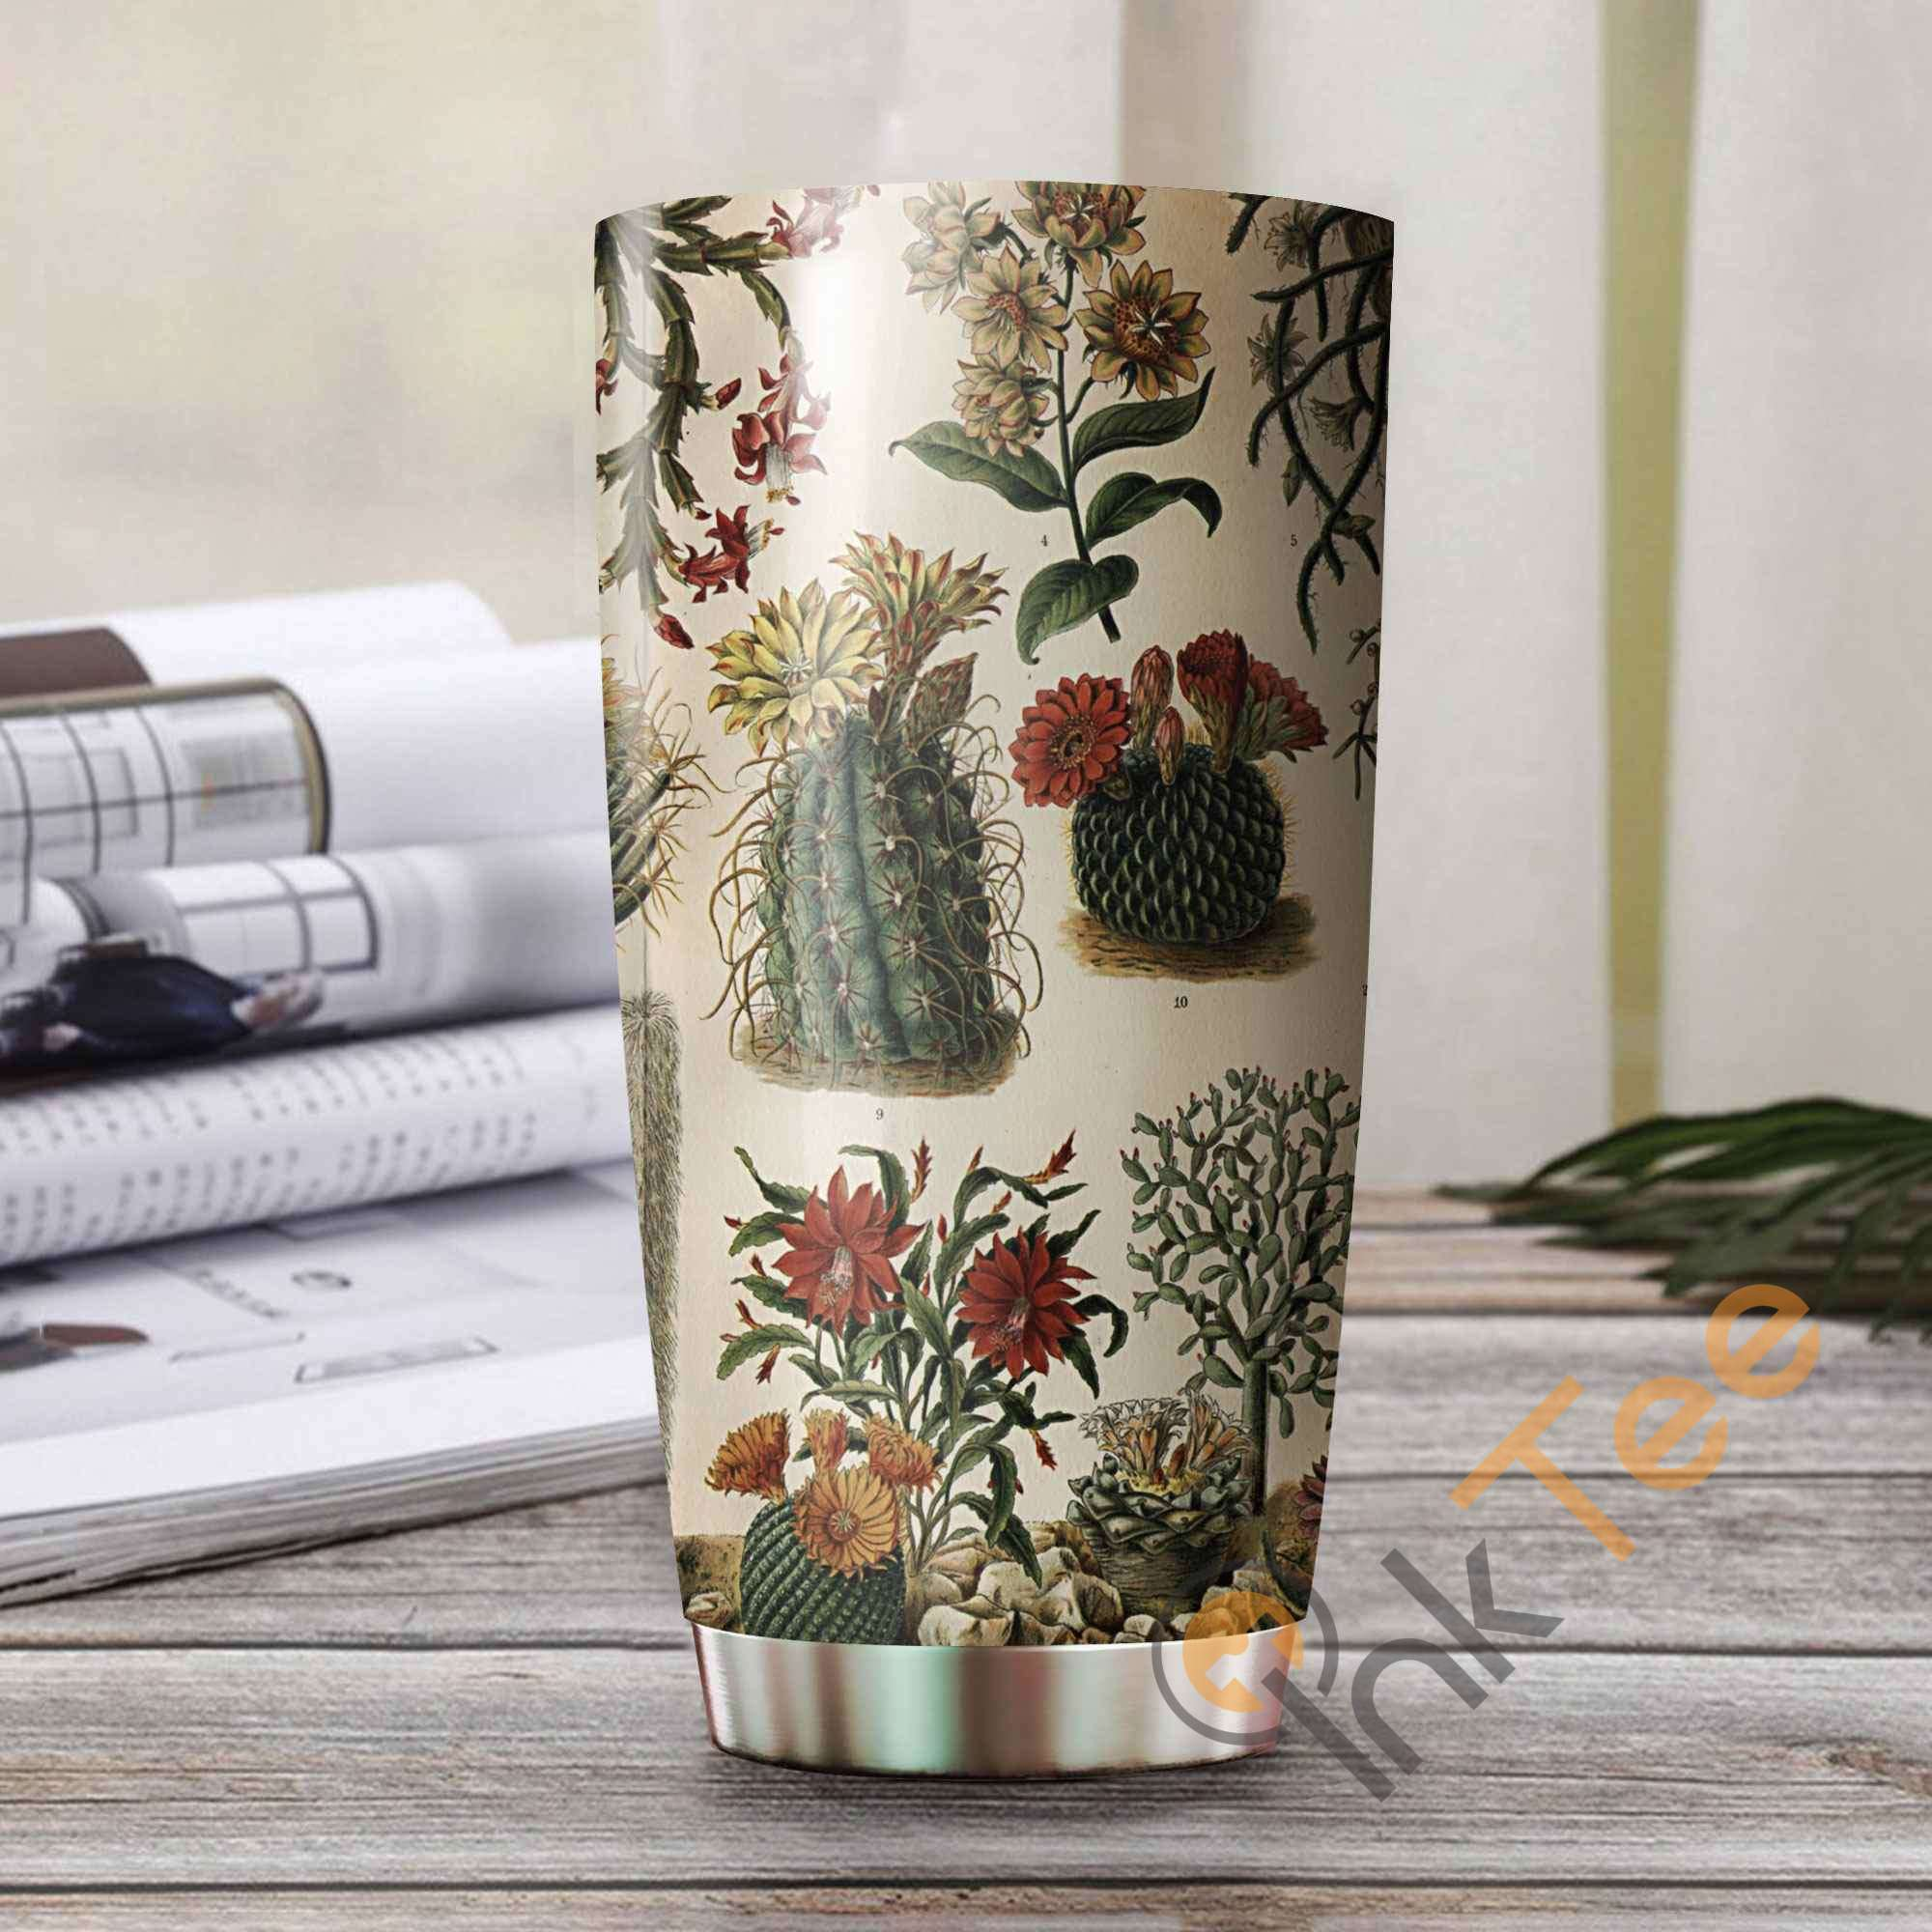 Love Cactus Amazon Best Seller Sku 3369 Stainless Steel Tumbler